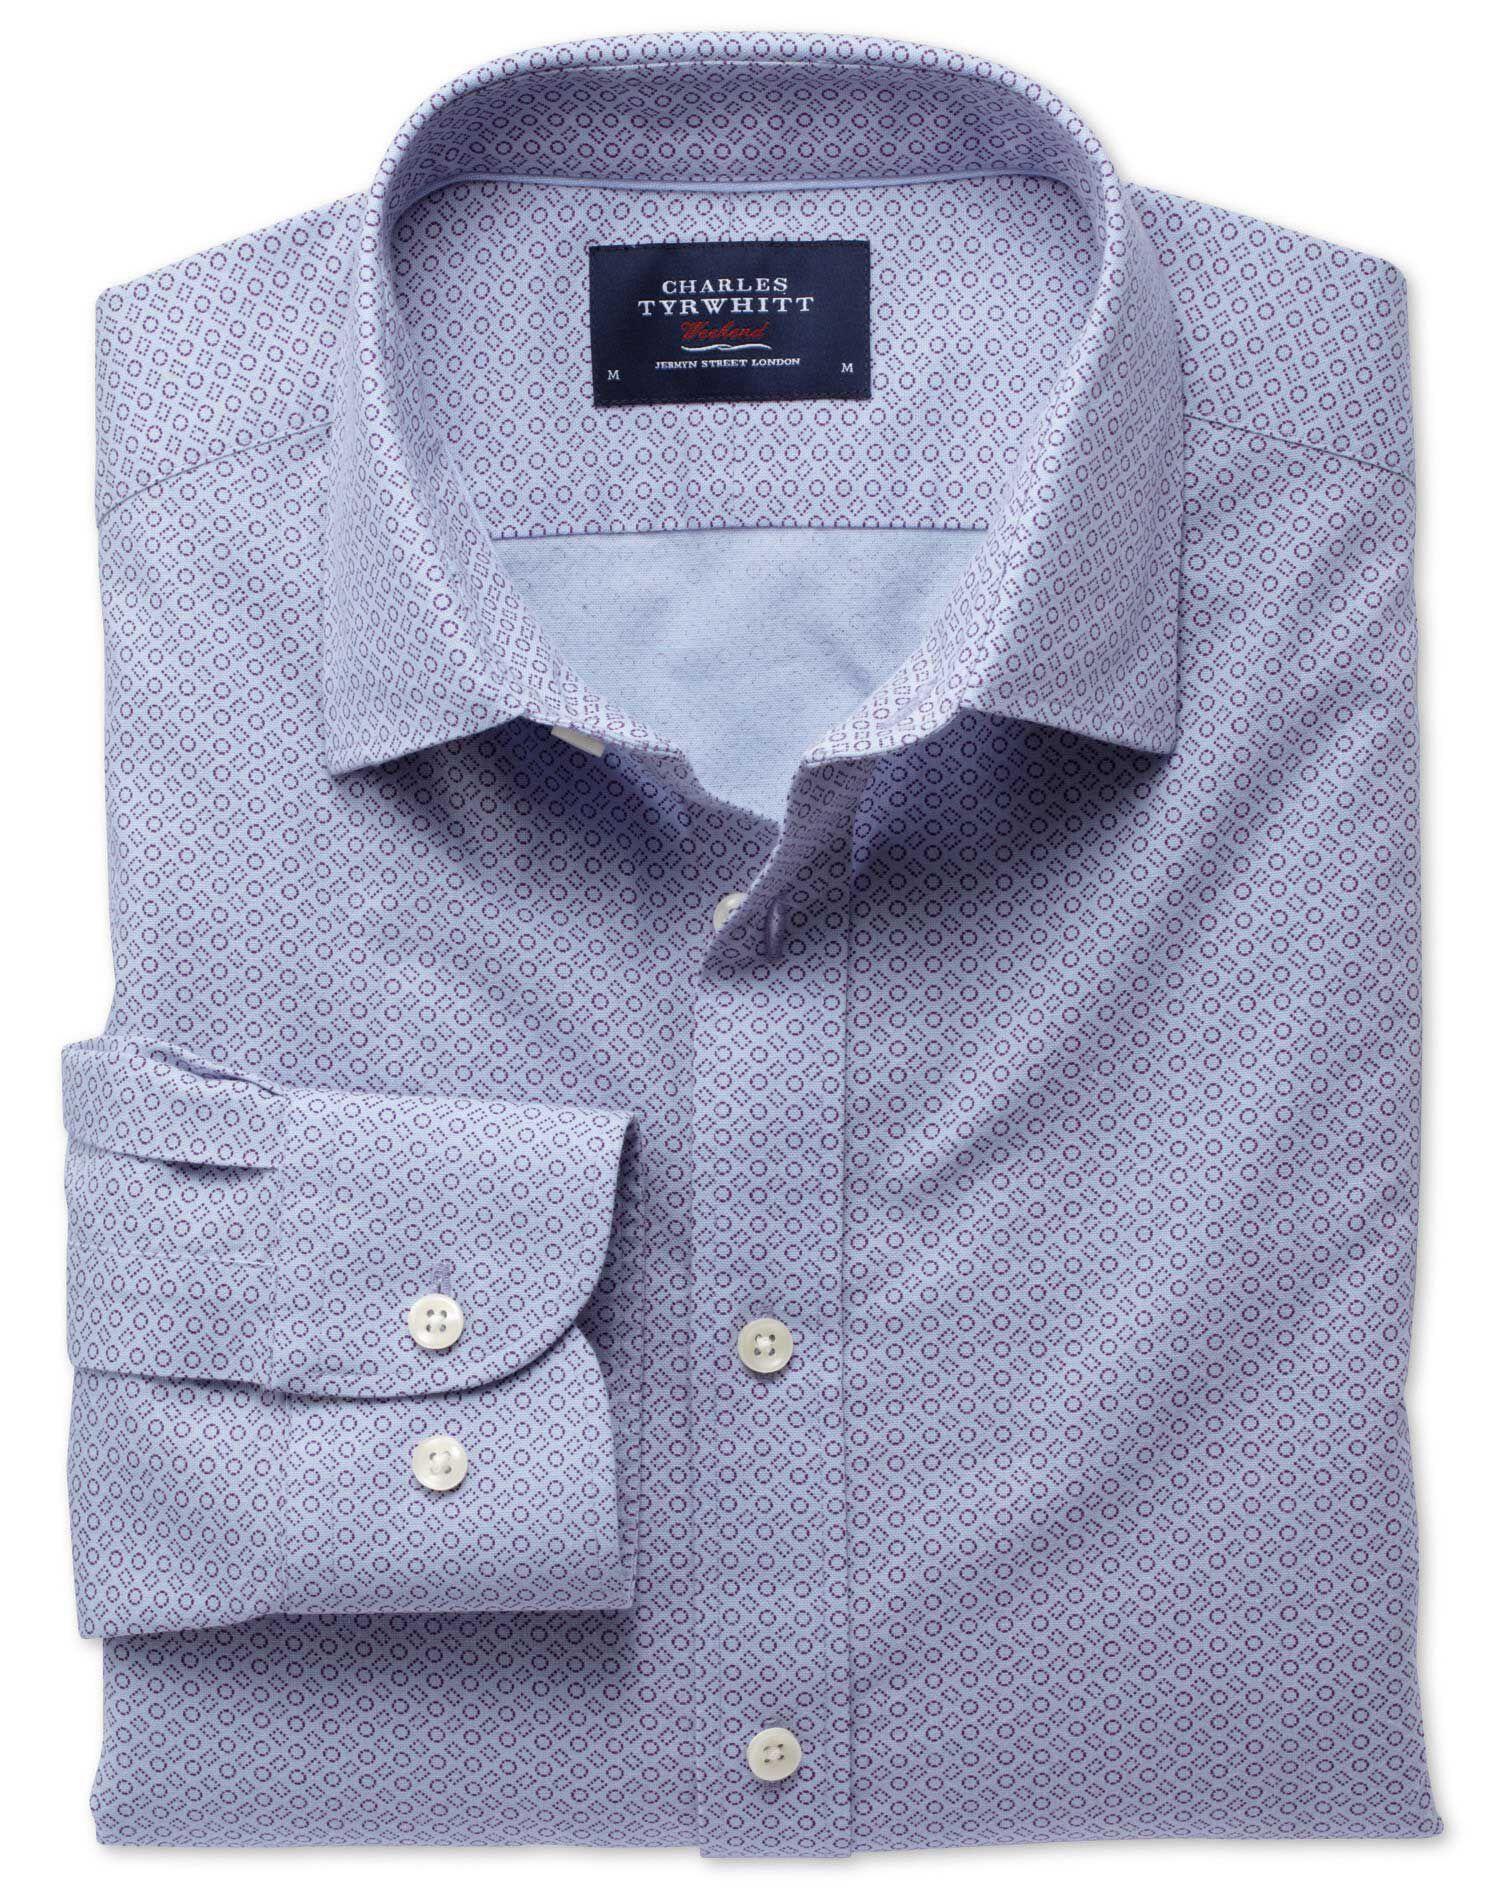 Classic Fit Sky Blue and Purple Geometric Print Cotton Shirt Single Cuff Size Medium by Charles Tyrw